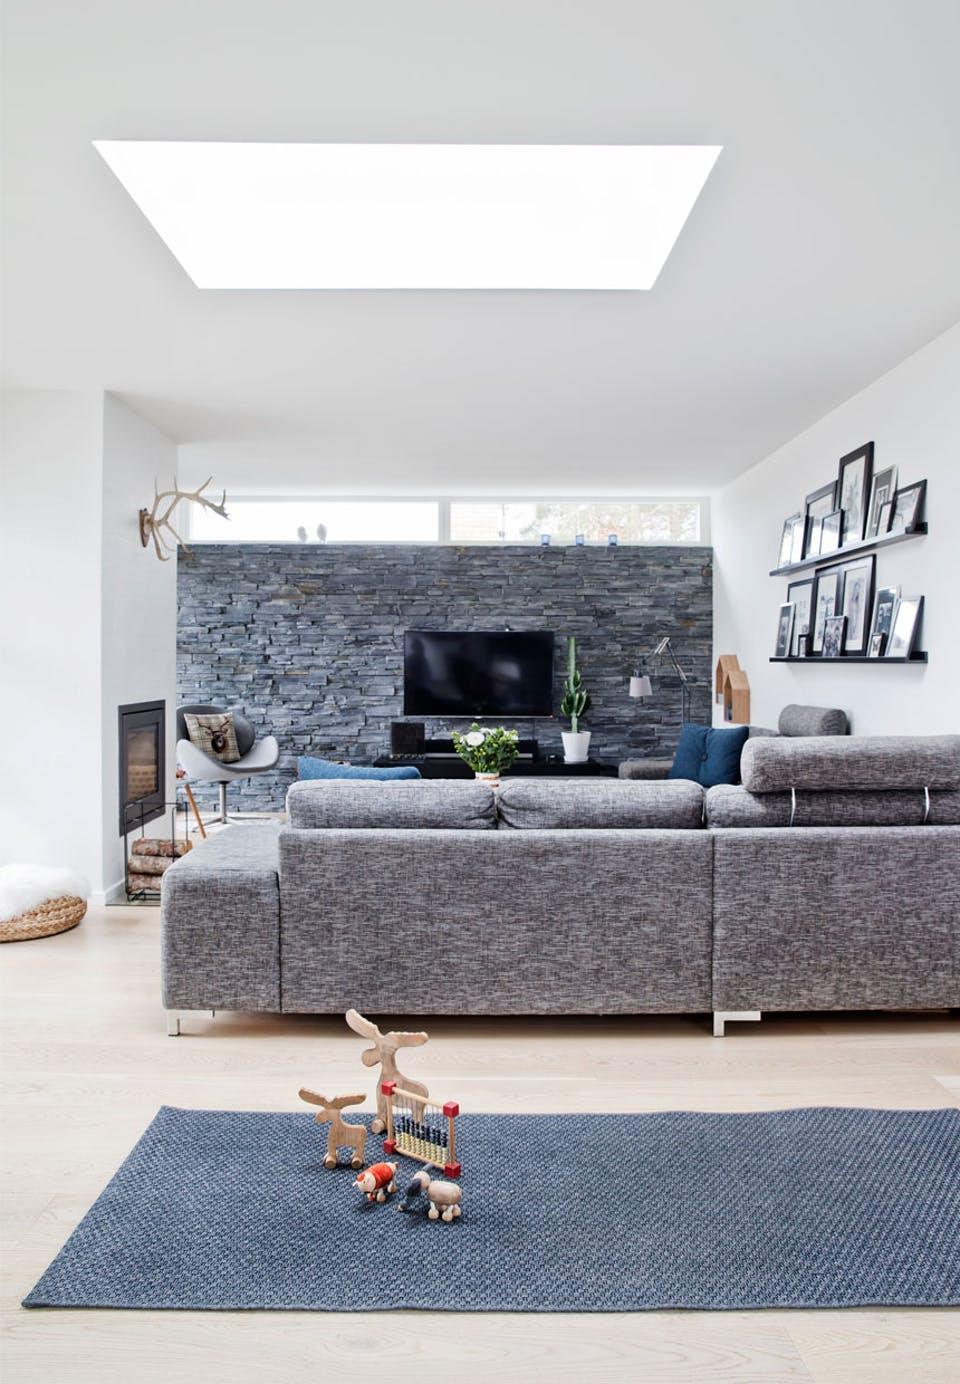 Danish House Tour - Minimalism in Greve19.jpg